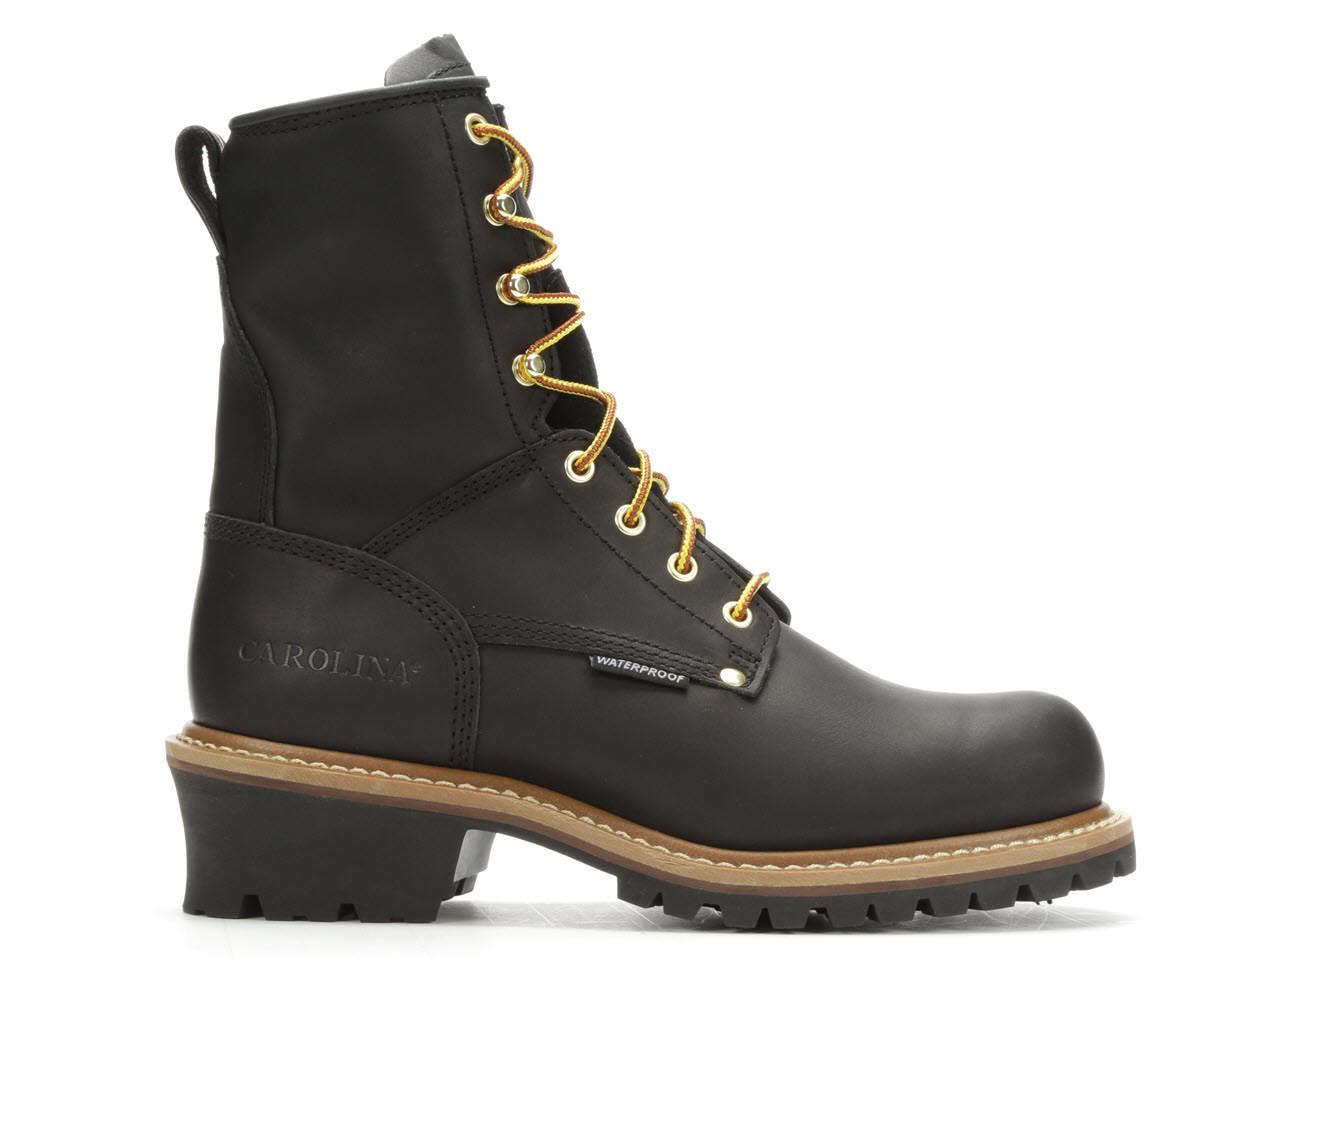 Carolina Boots CA8823 8 Inch Nonsteel Toe Men's Boots (Black Leather)